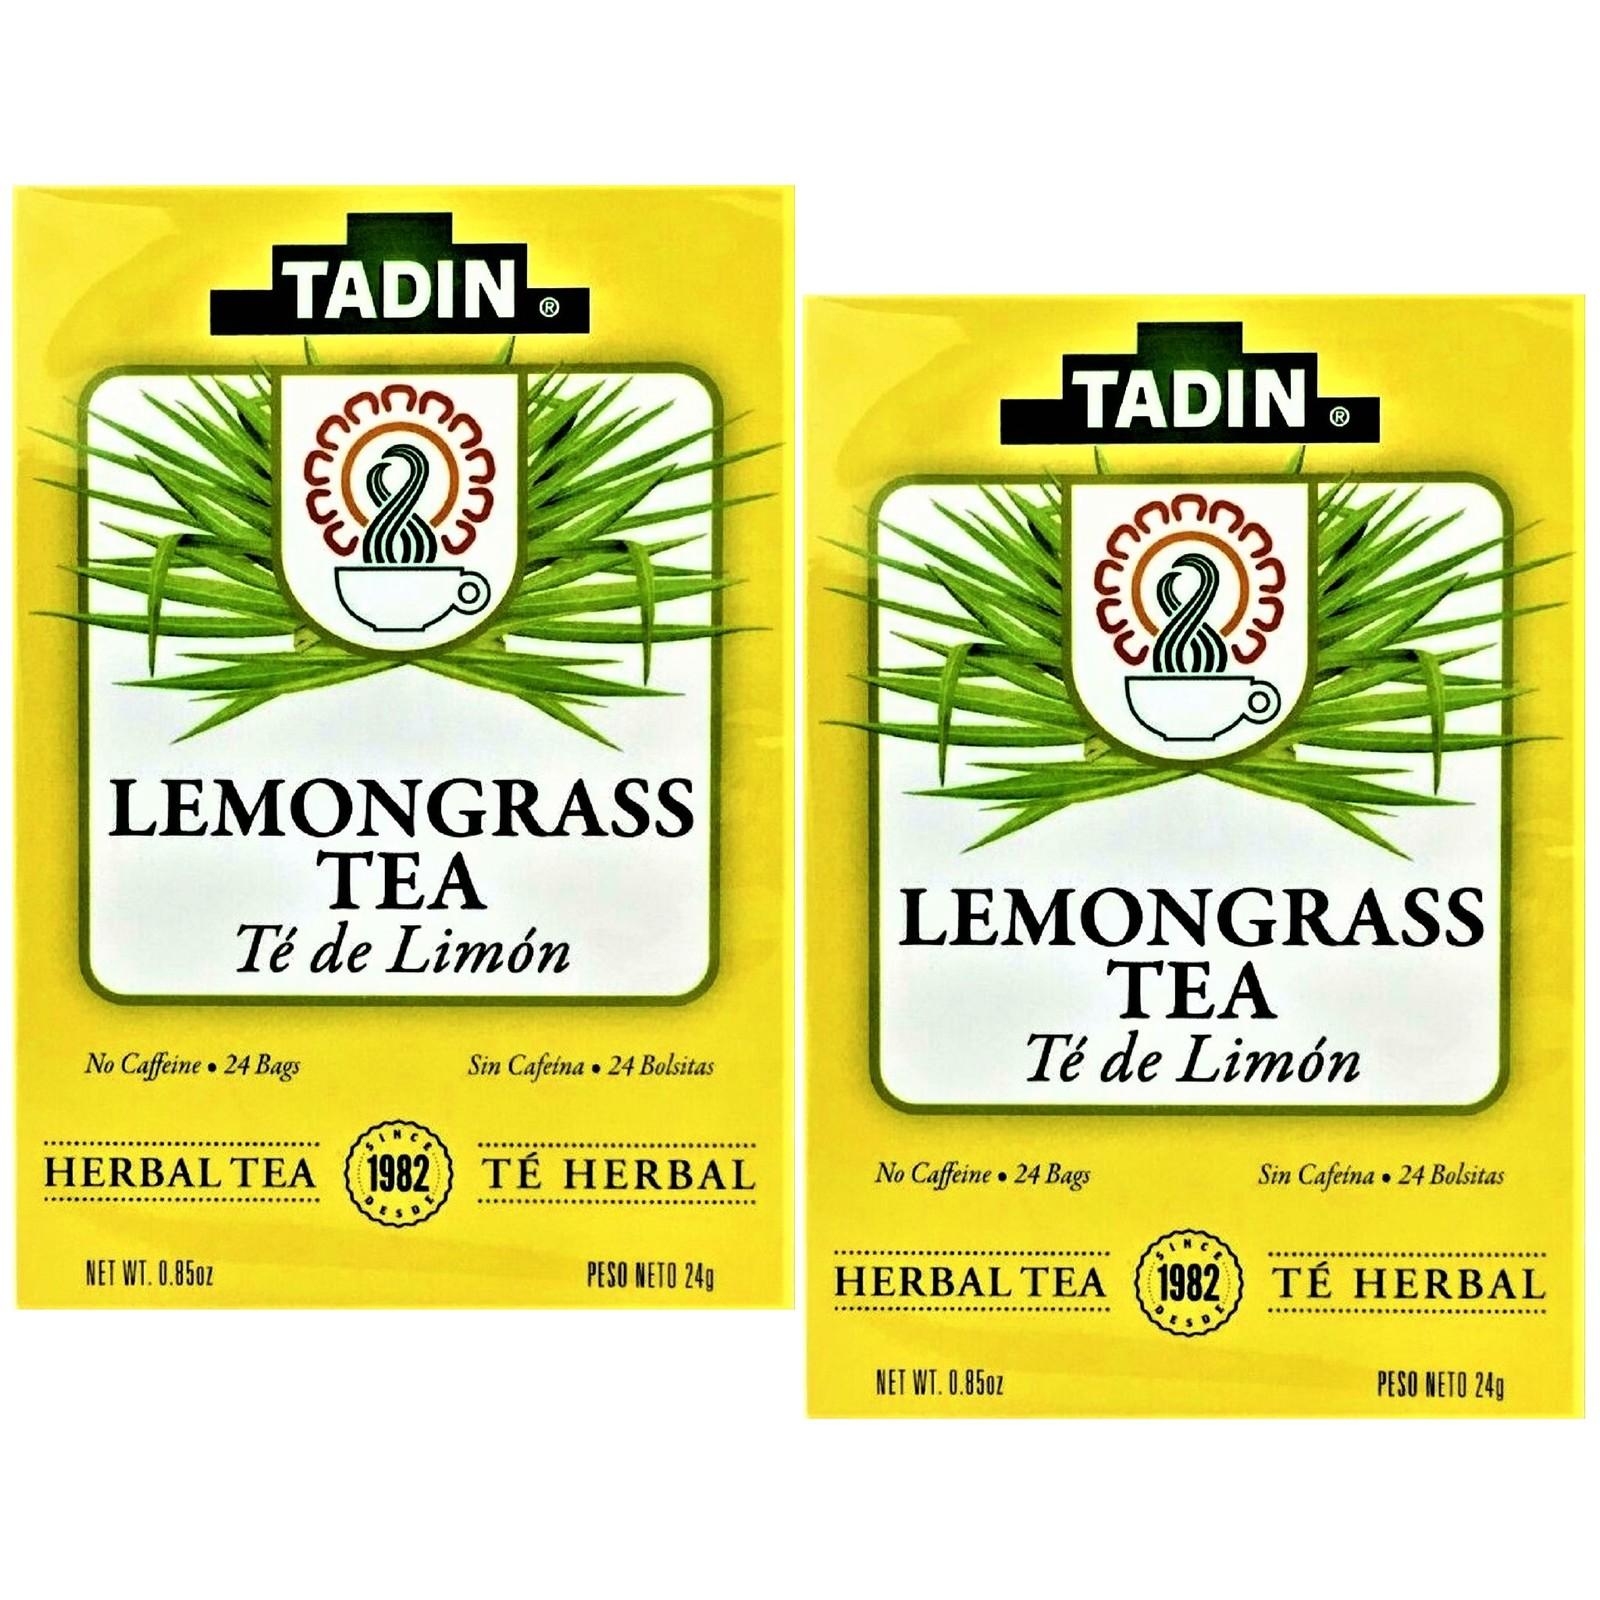 Tadin Lemongrass Tea Herbal/Tisana 24 bags Box 2 Boxes - $14.80